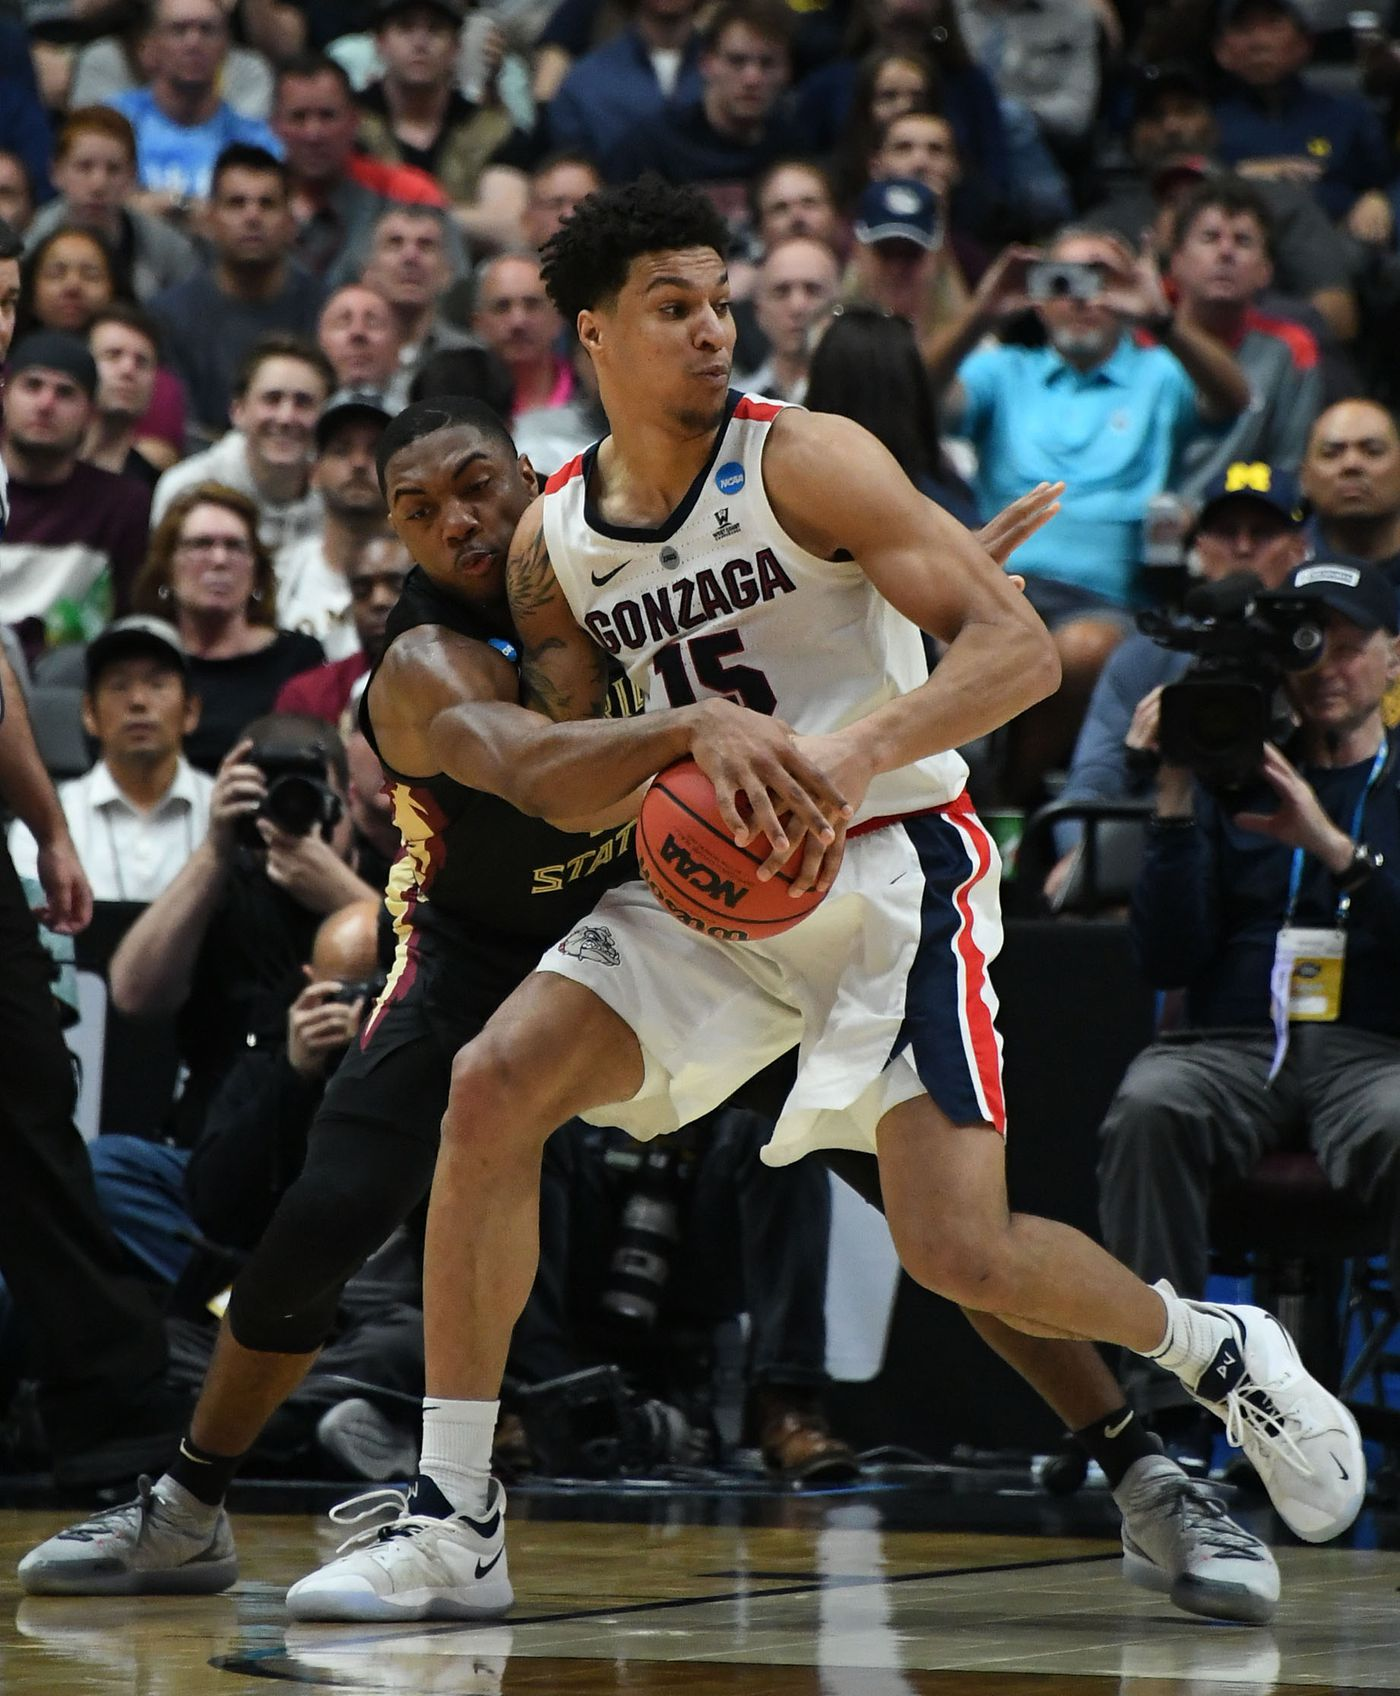 2019 GBB Community Mock NBA Draft: DOUBLE GRIZZLIES TRADE ALERT